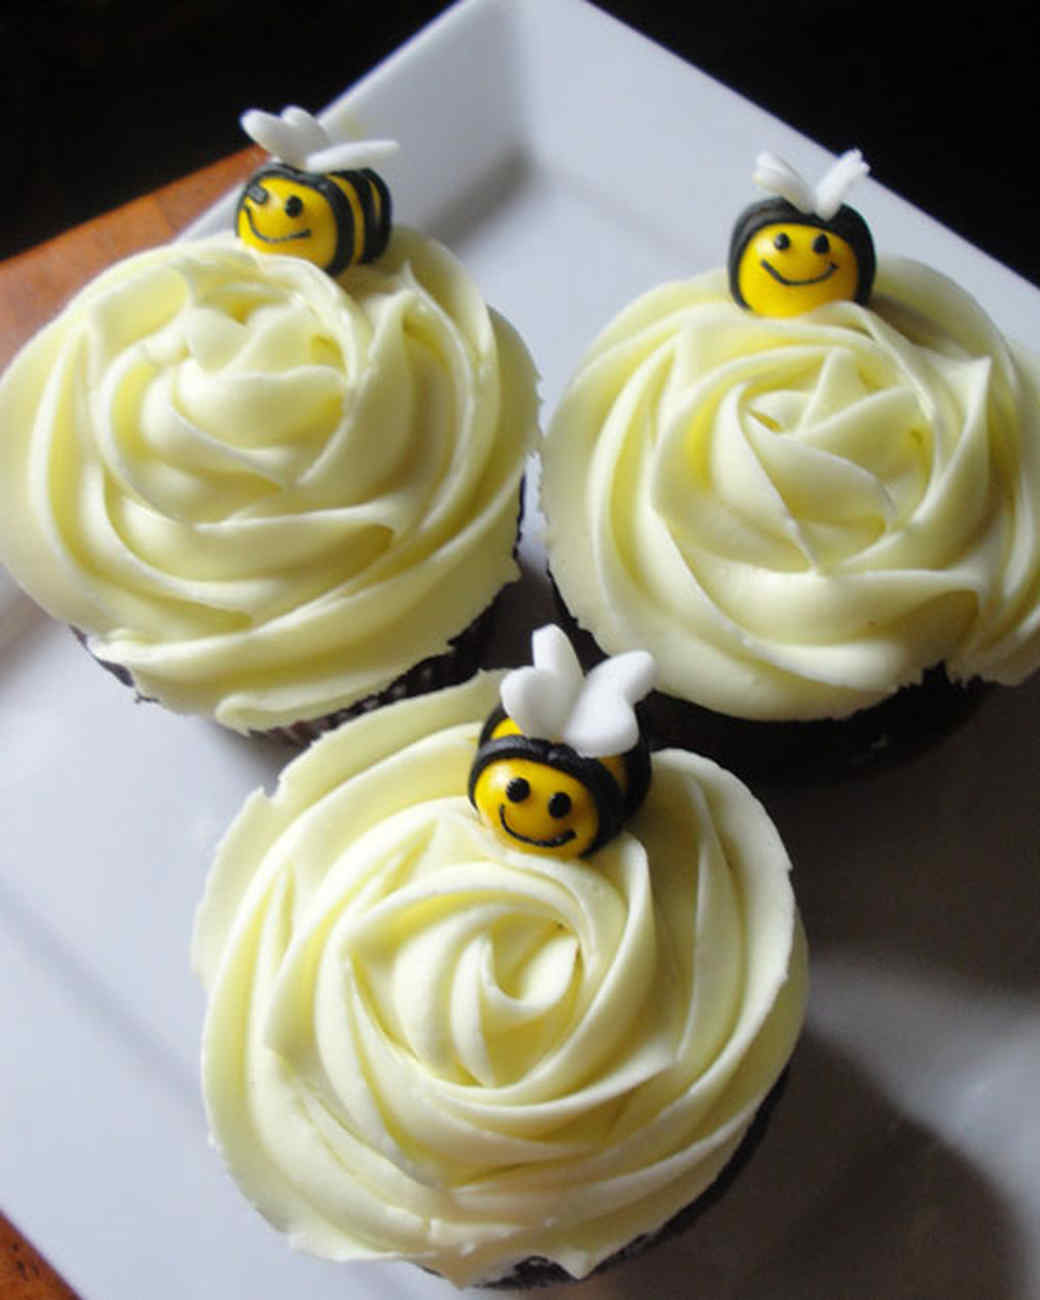 cupcake_contest_0211_honey_bee_cupcakes.jpg